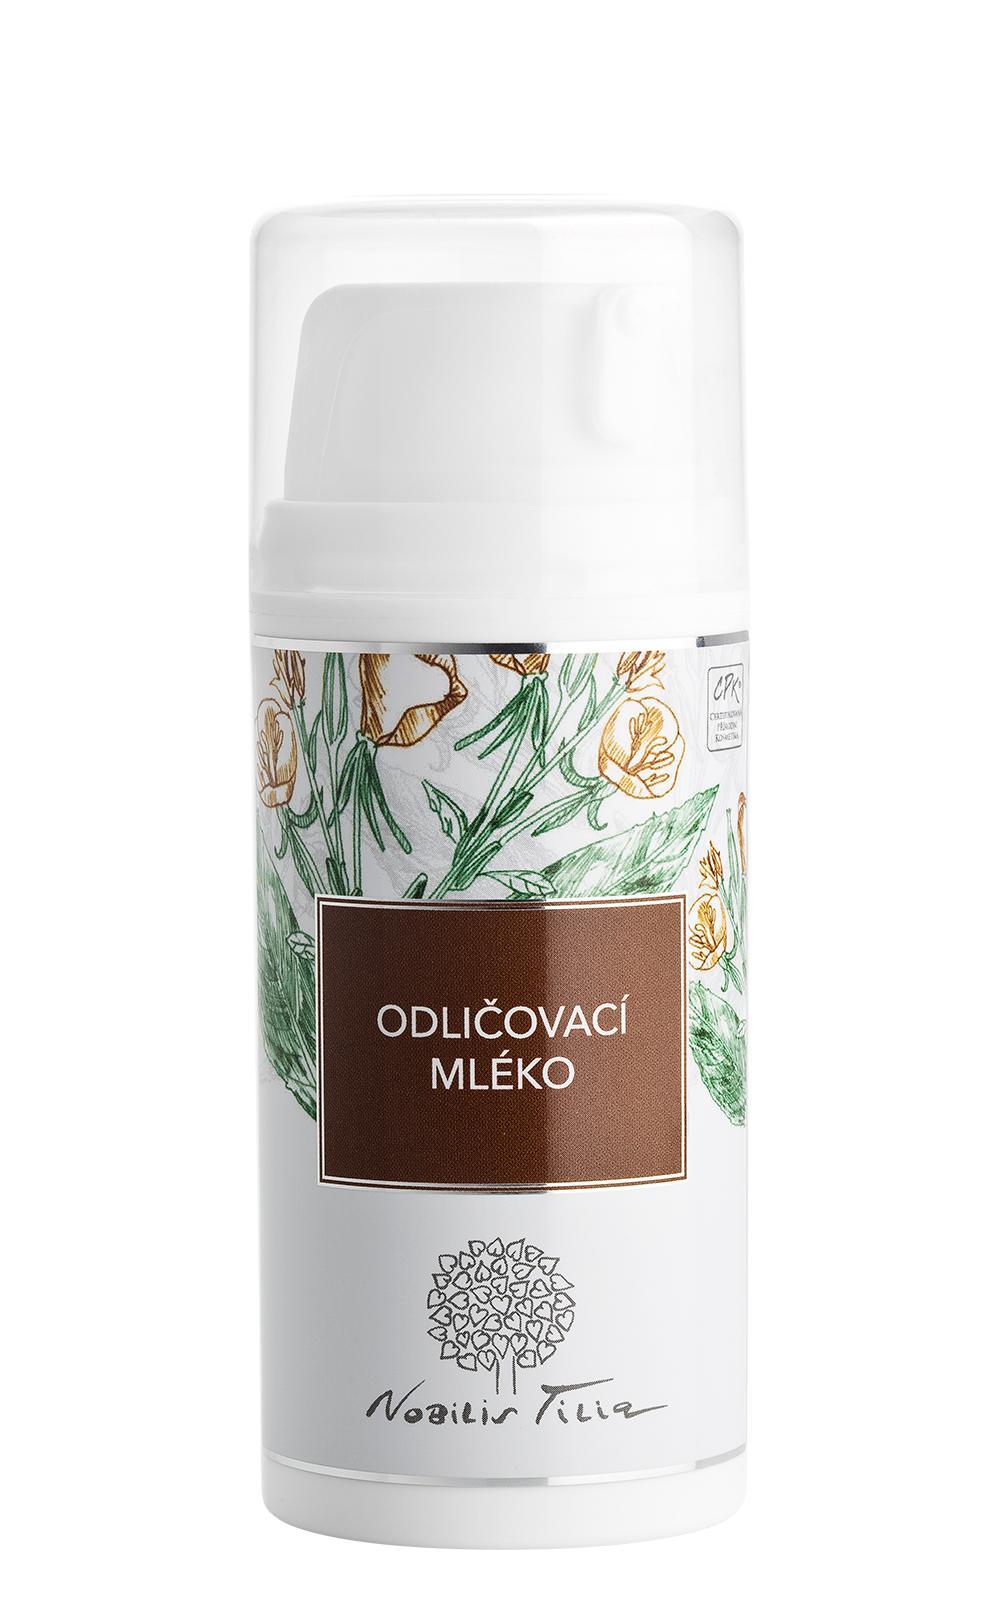 Nobilis Tilia Nobilis - Odličovacie mlieko, 100ml